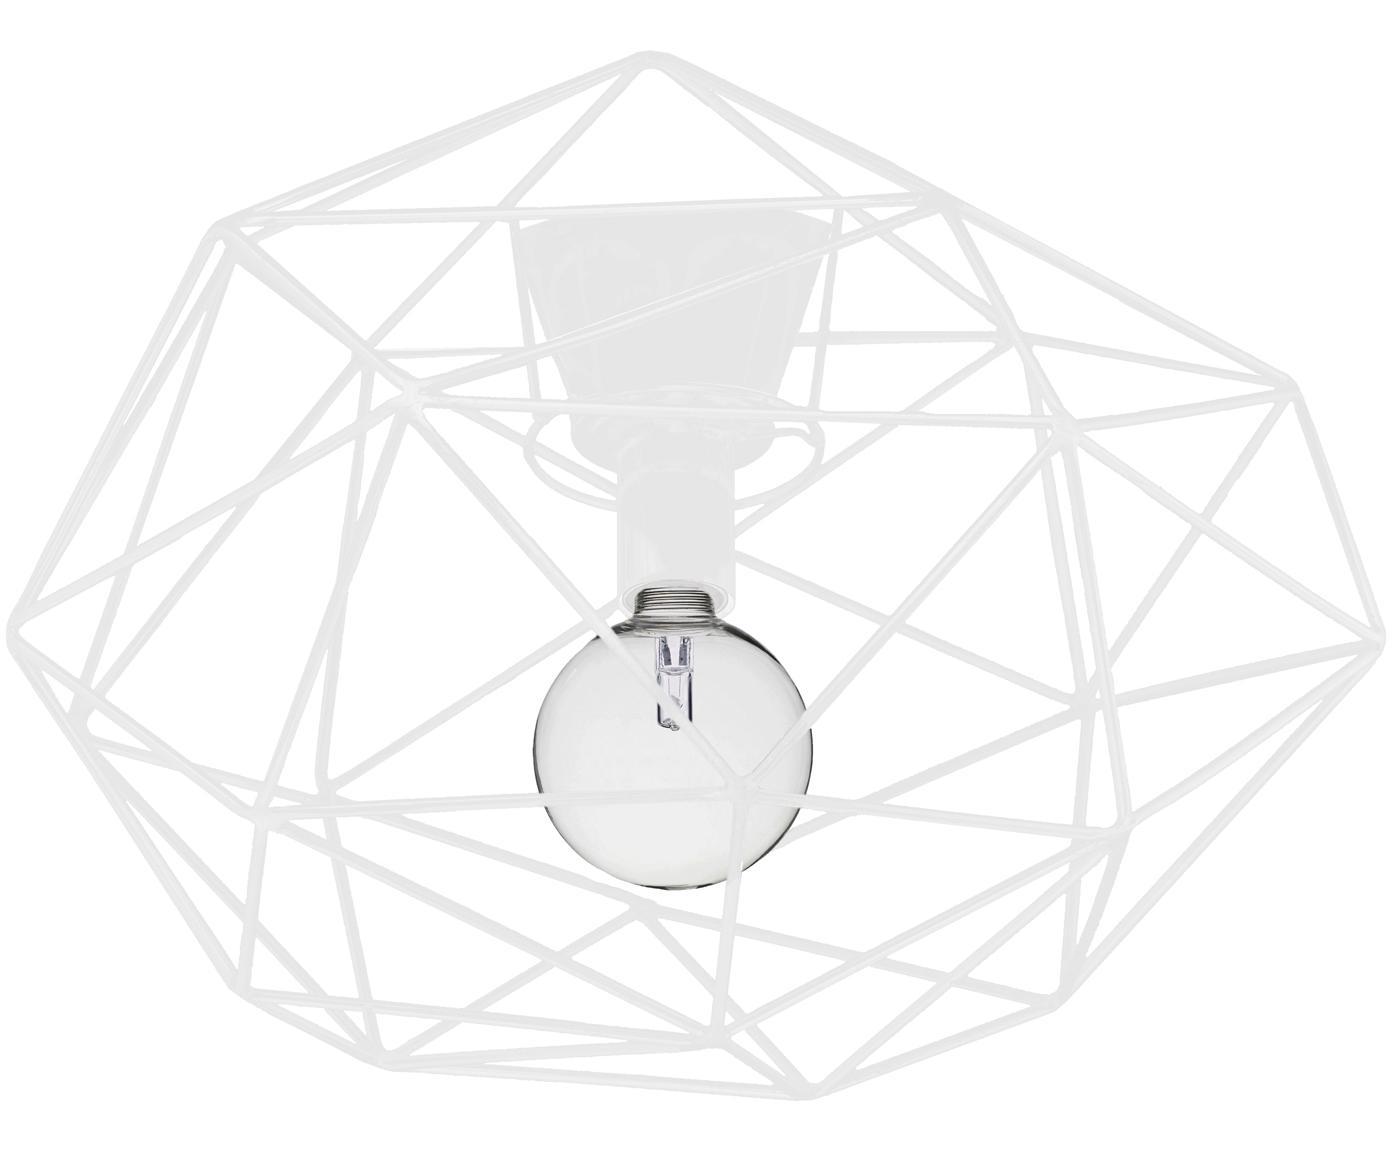 Plafondlamp Diamond, Gelakt messing, Wit, Ø 50 x H 32 cm